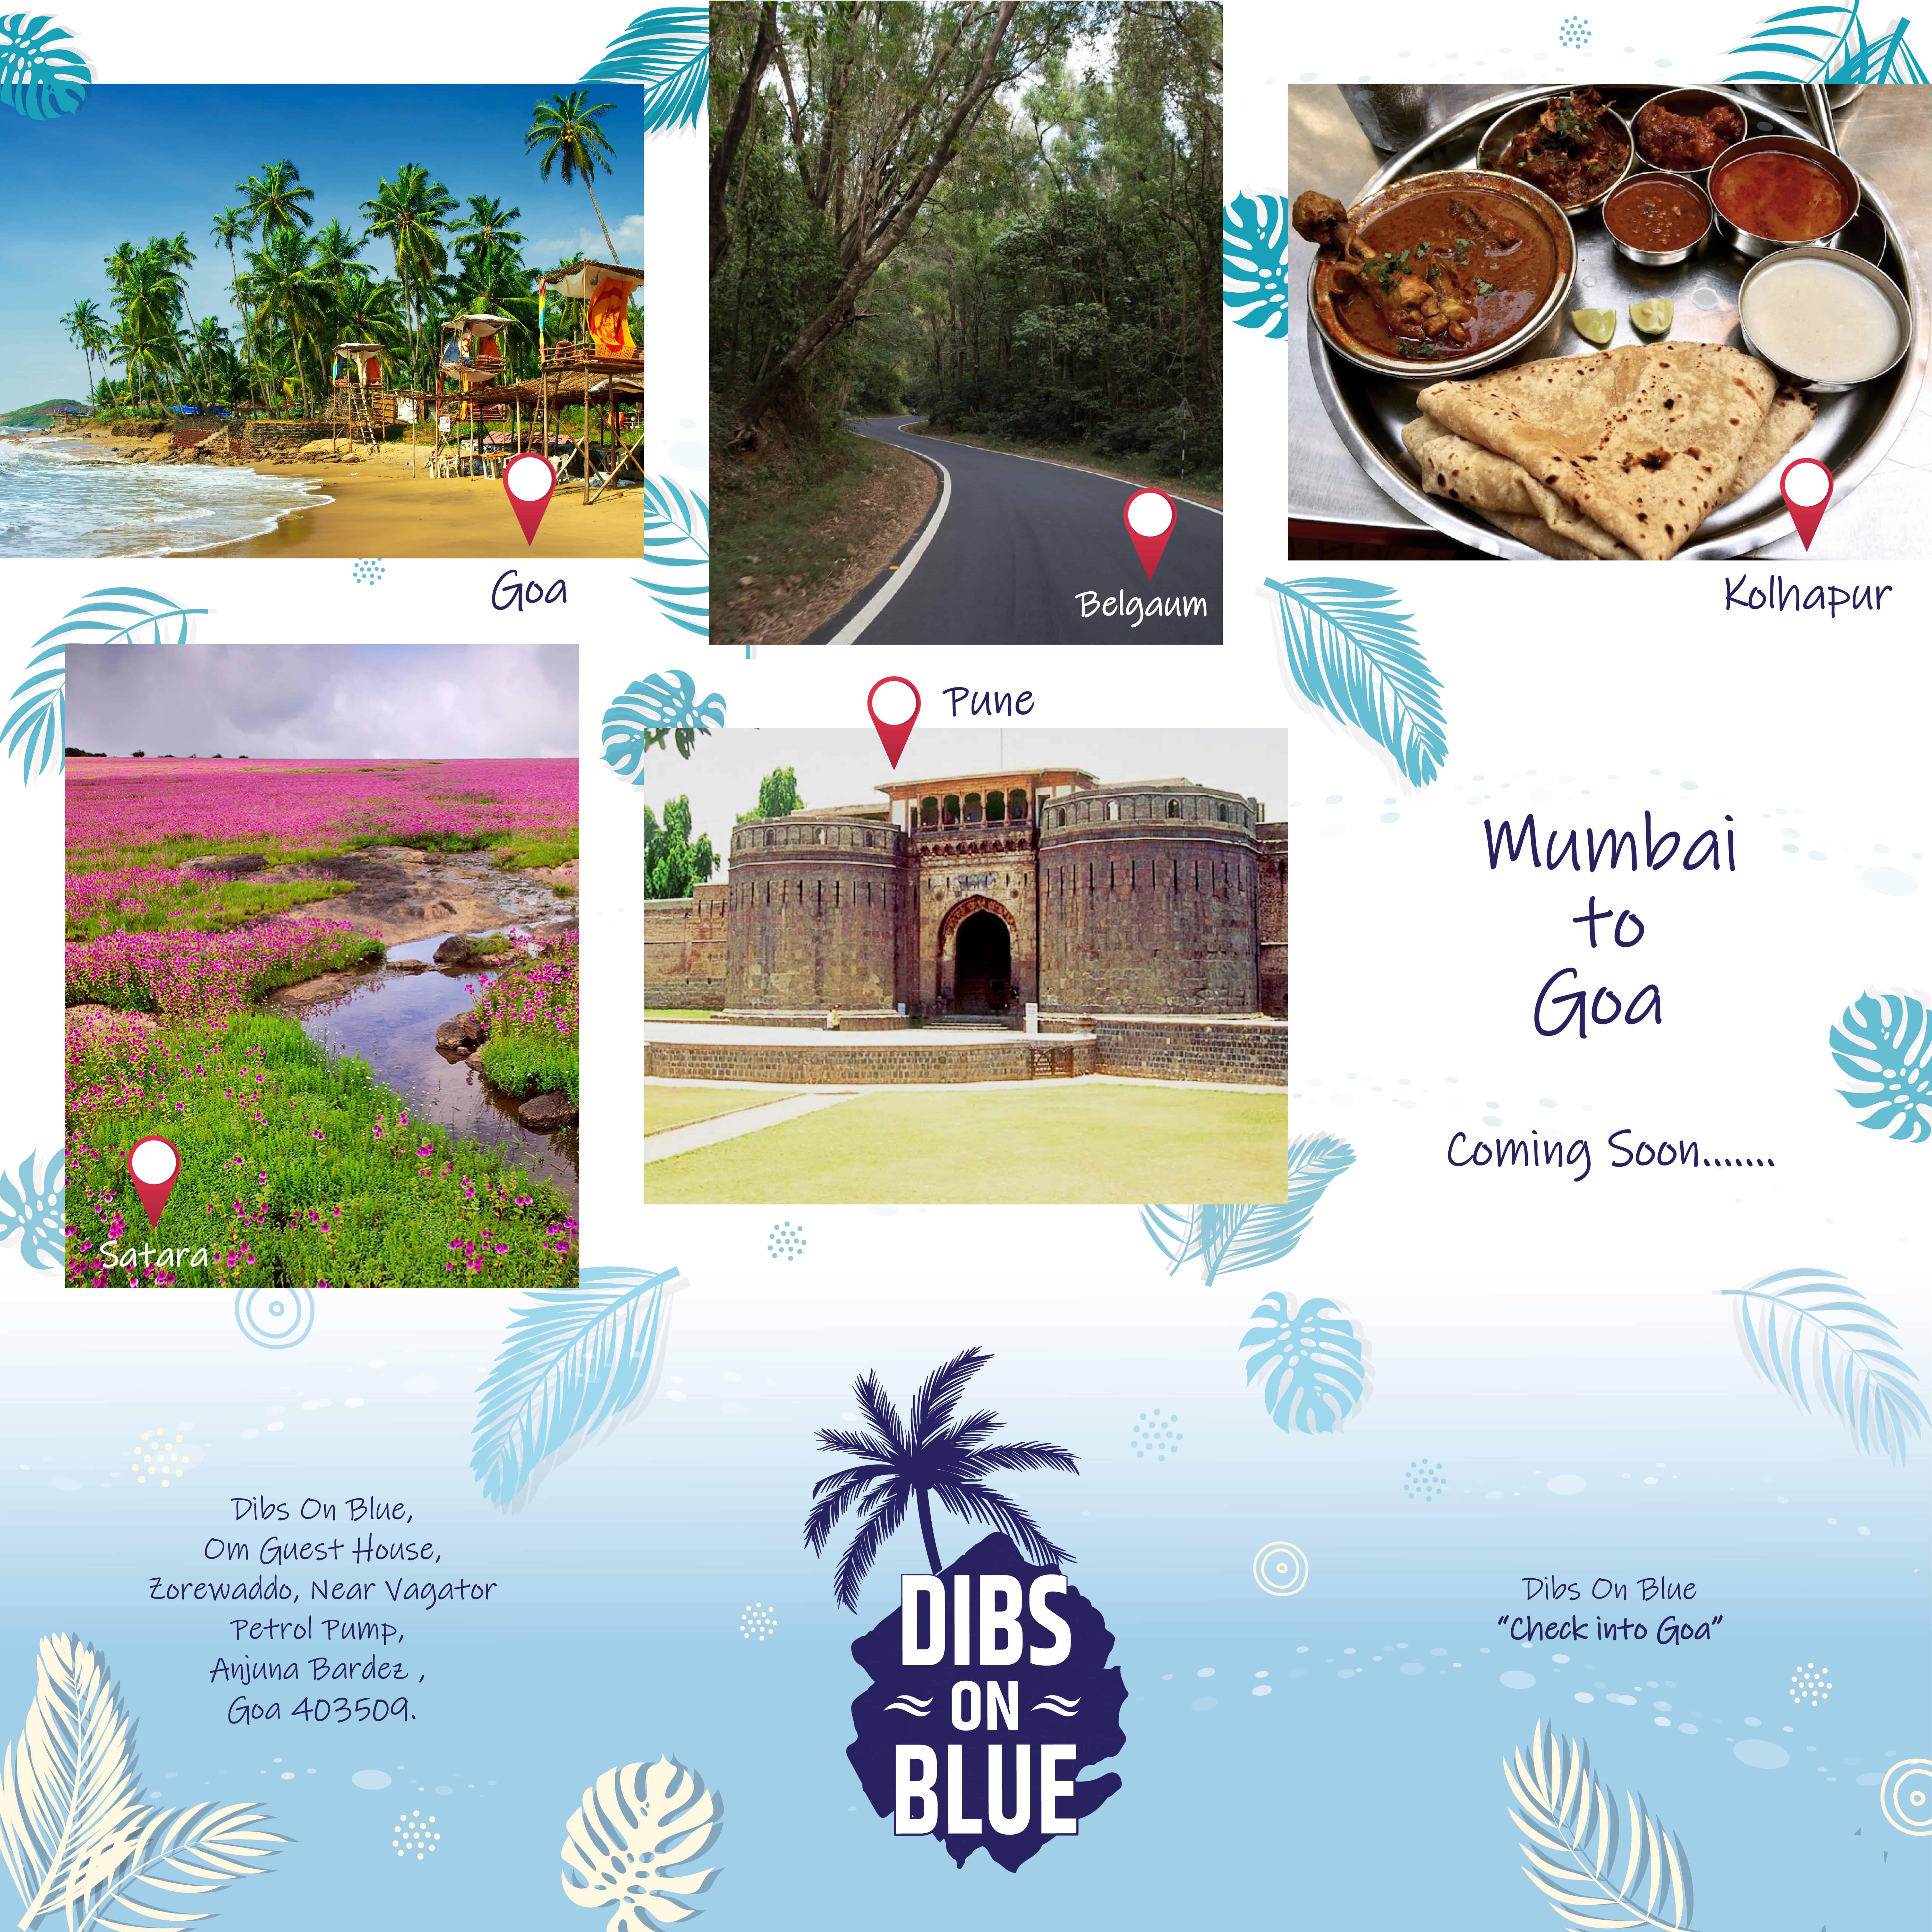 Dibs on blue_20th july-01-min